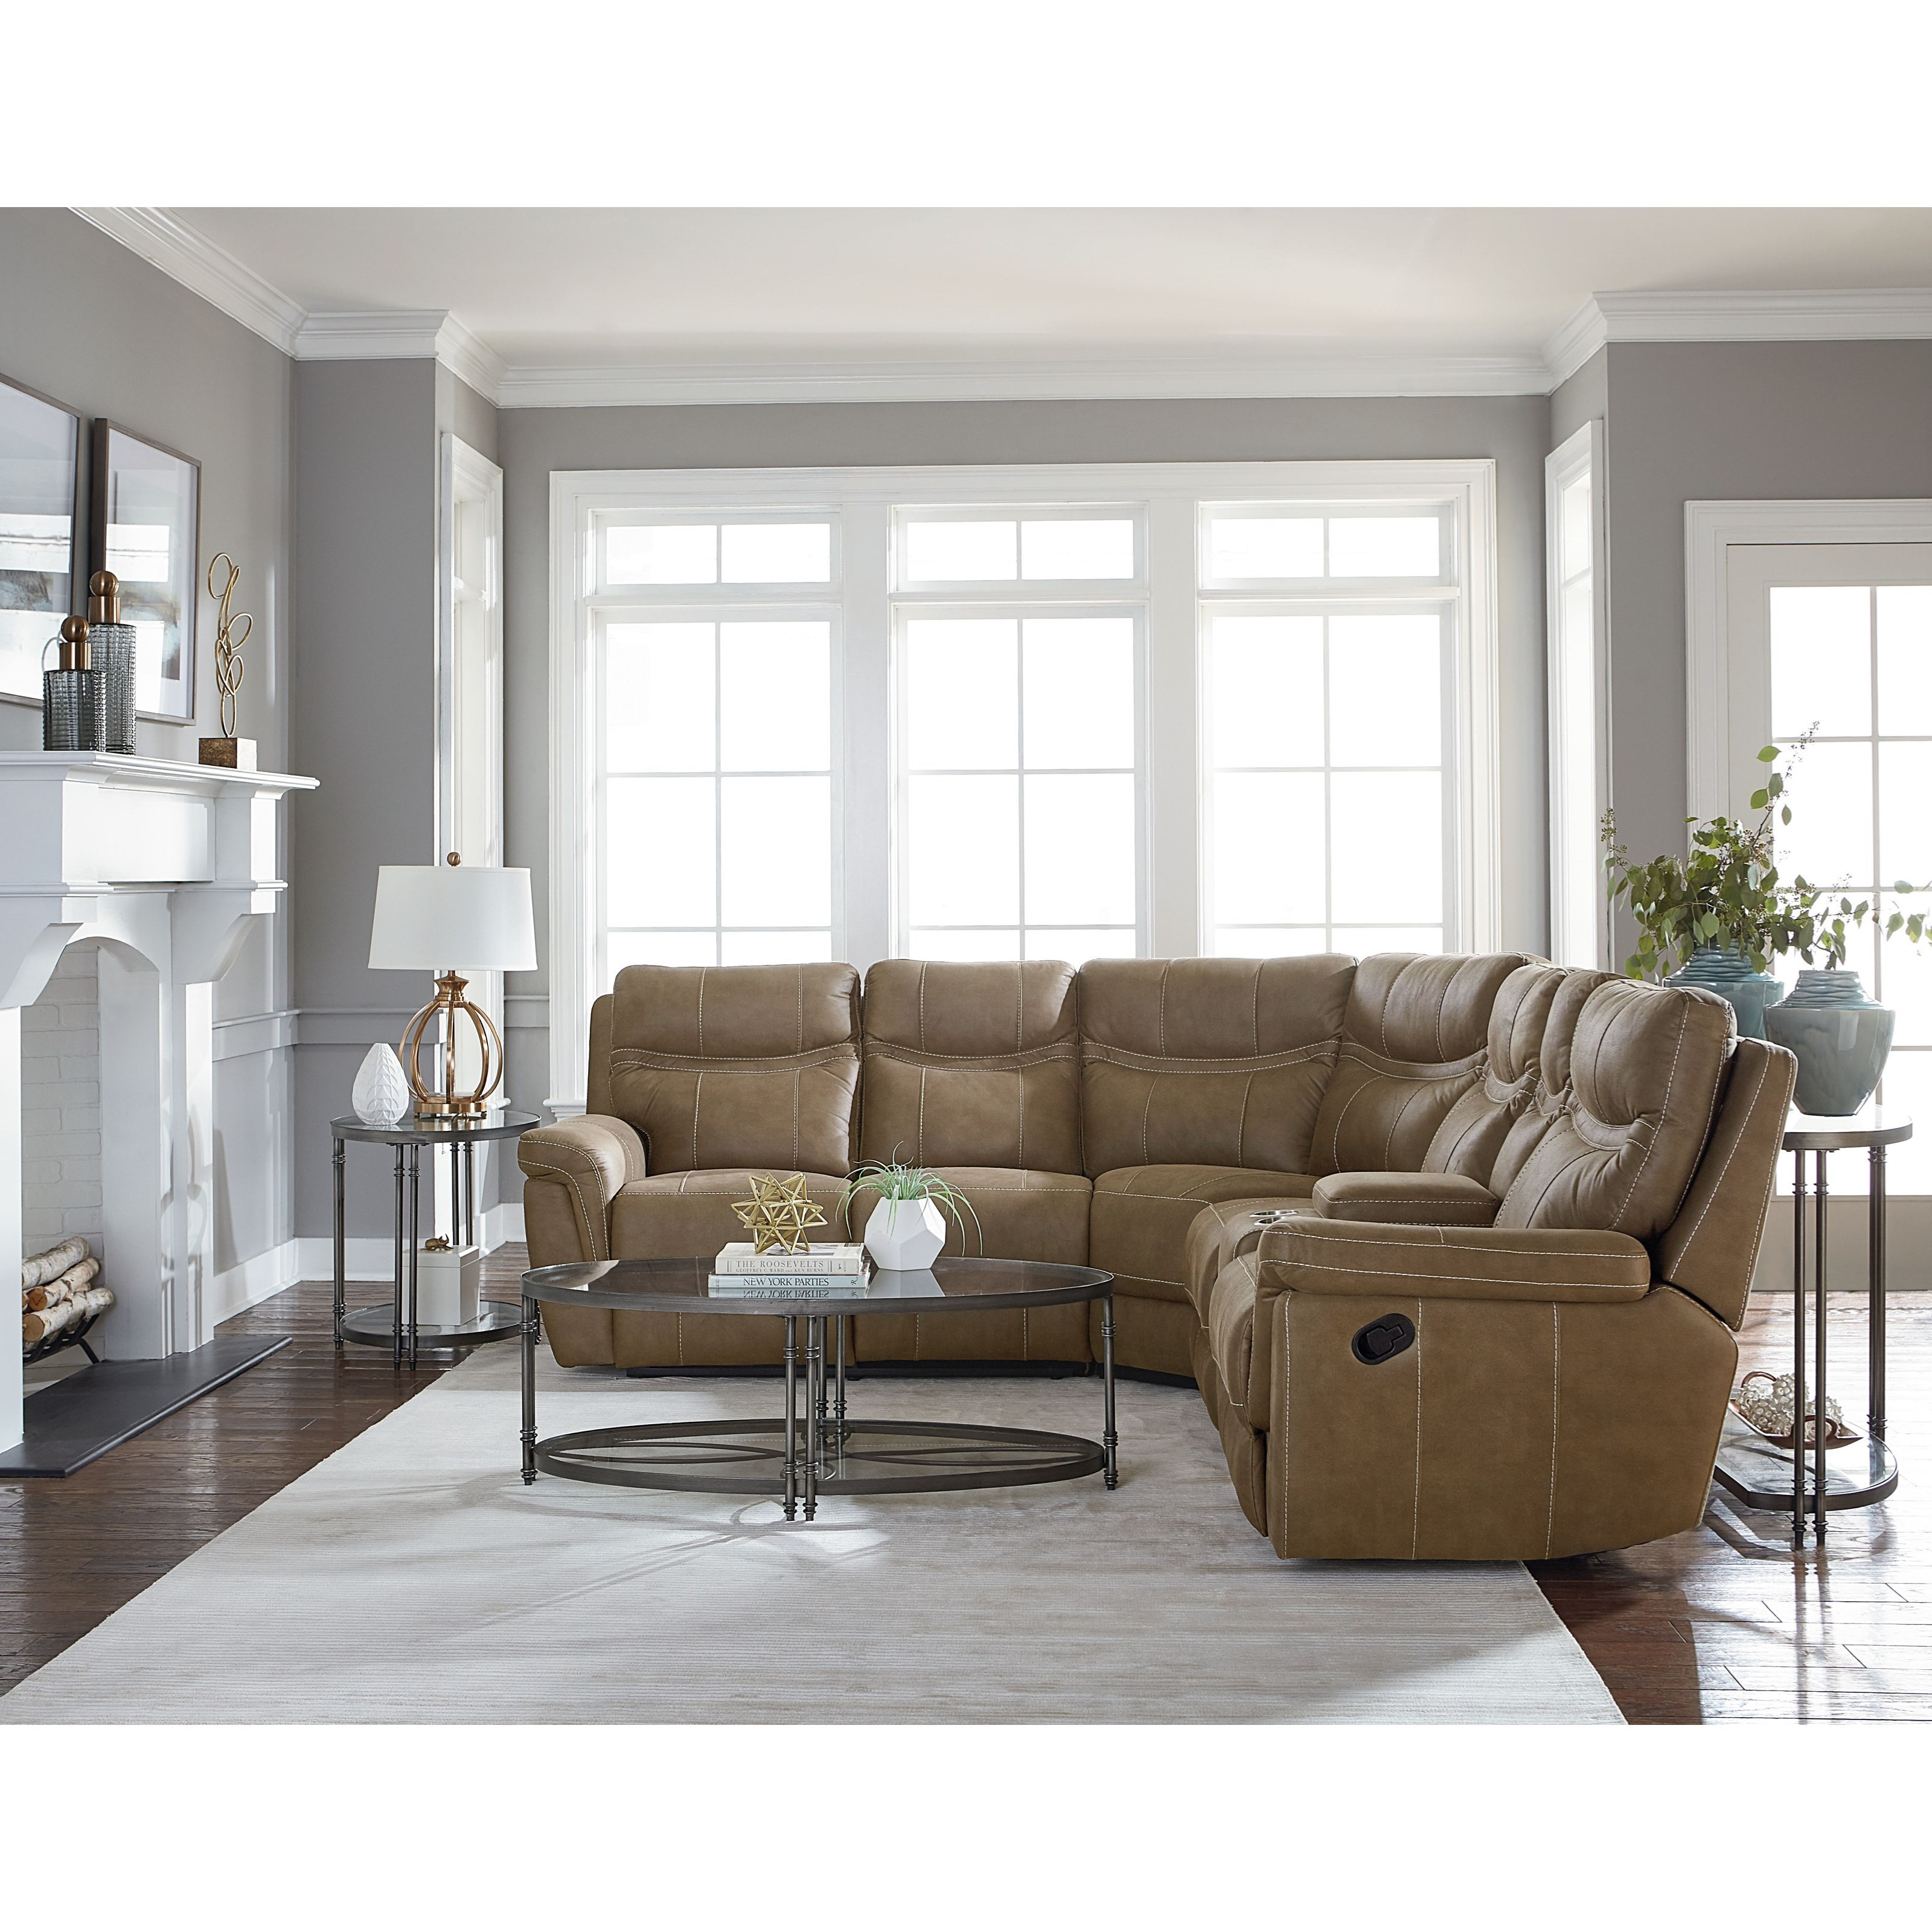 Standard Furniture Boardwalk Contemporary Sectional Sofa